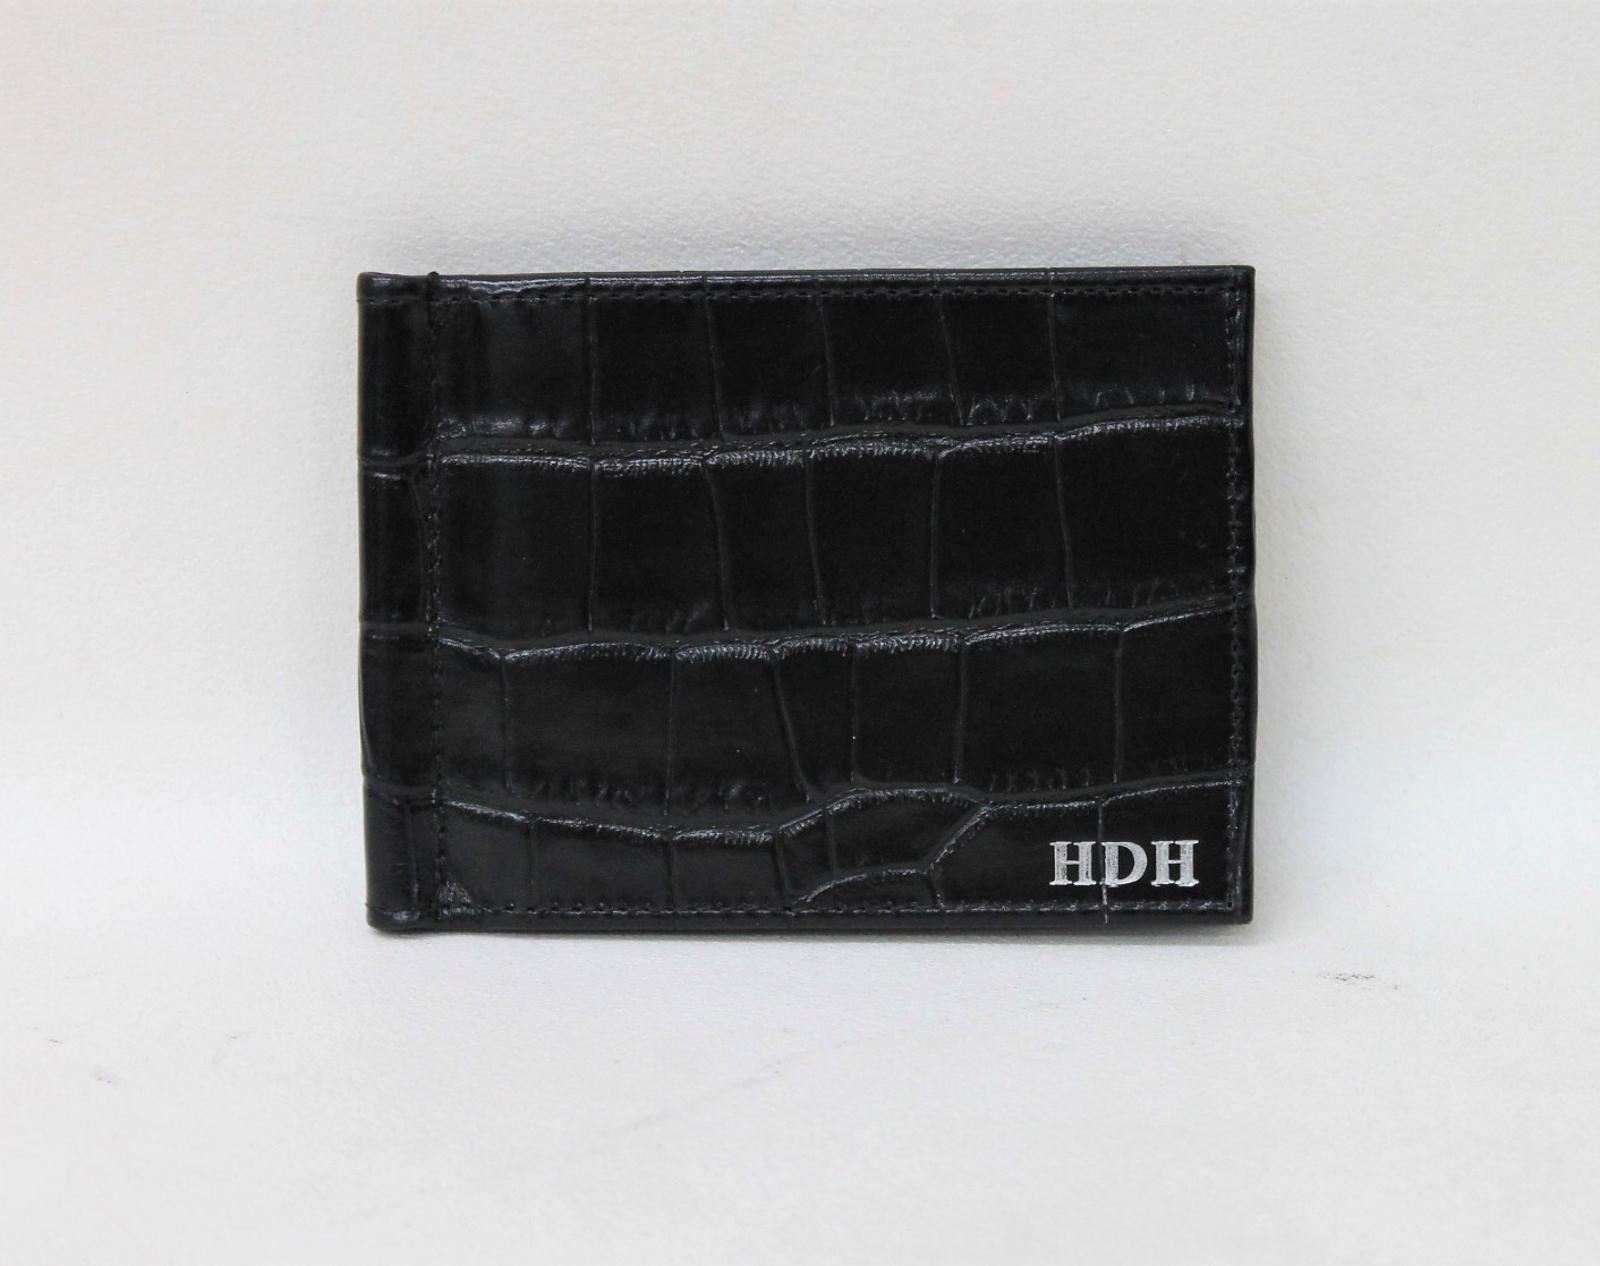 NWOT-ASPINAL-OF-LONDON-Men-039-s-Money-Clip-Croc-Black-Bifold-Leather-Wallet